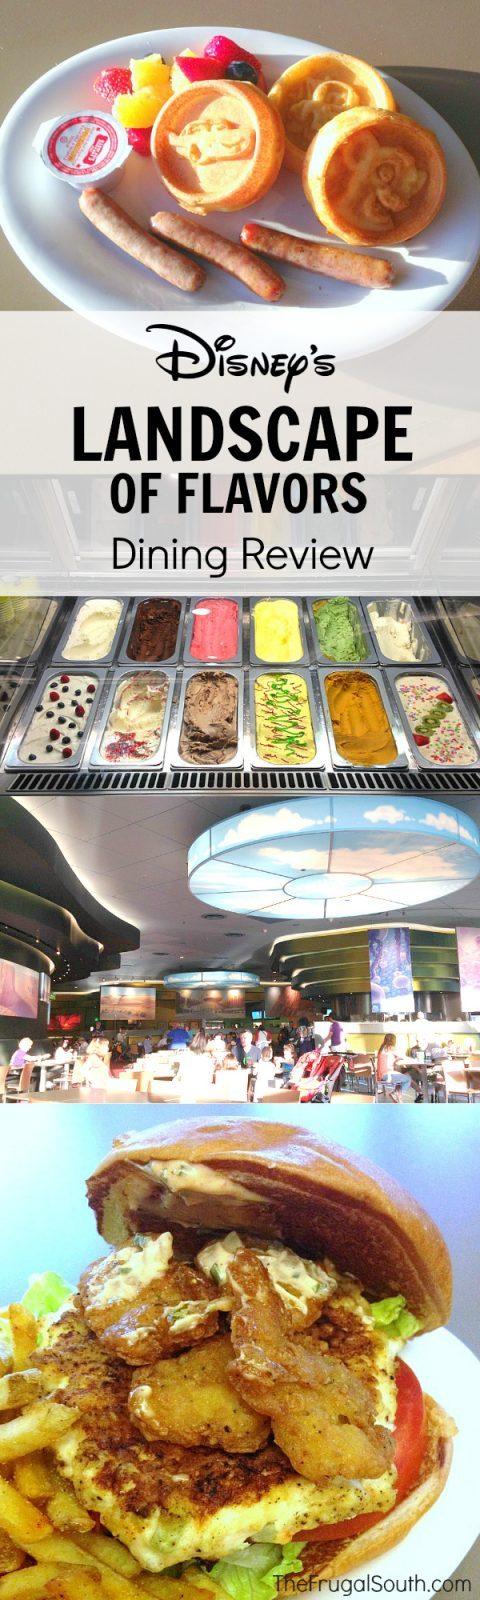 Disney's Landscape of Flavors Dining Review Pinterest Image